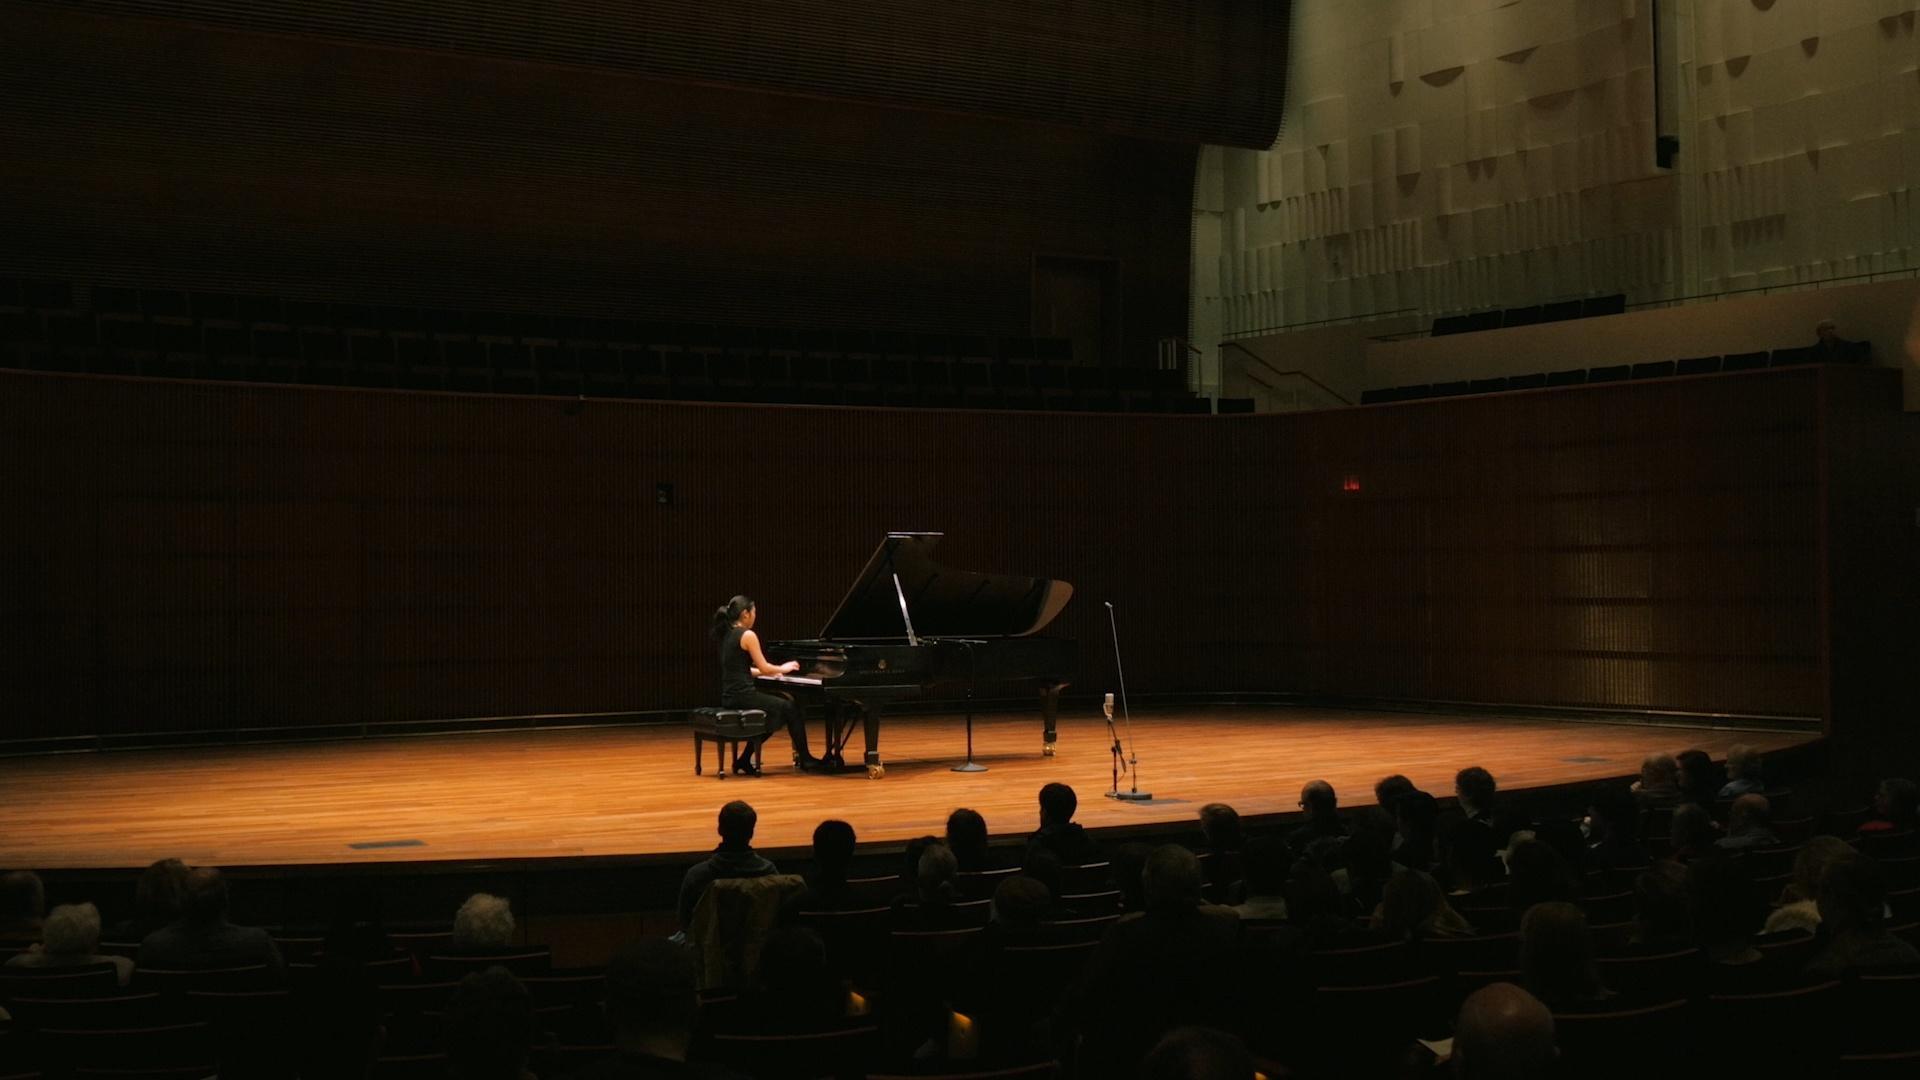 The Schubert Club: Zhen Tu - Etude No. 3 Un Sospiro